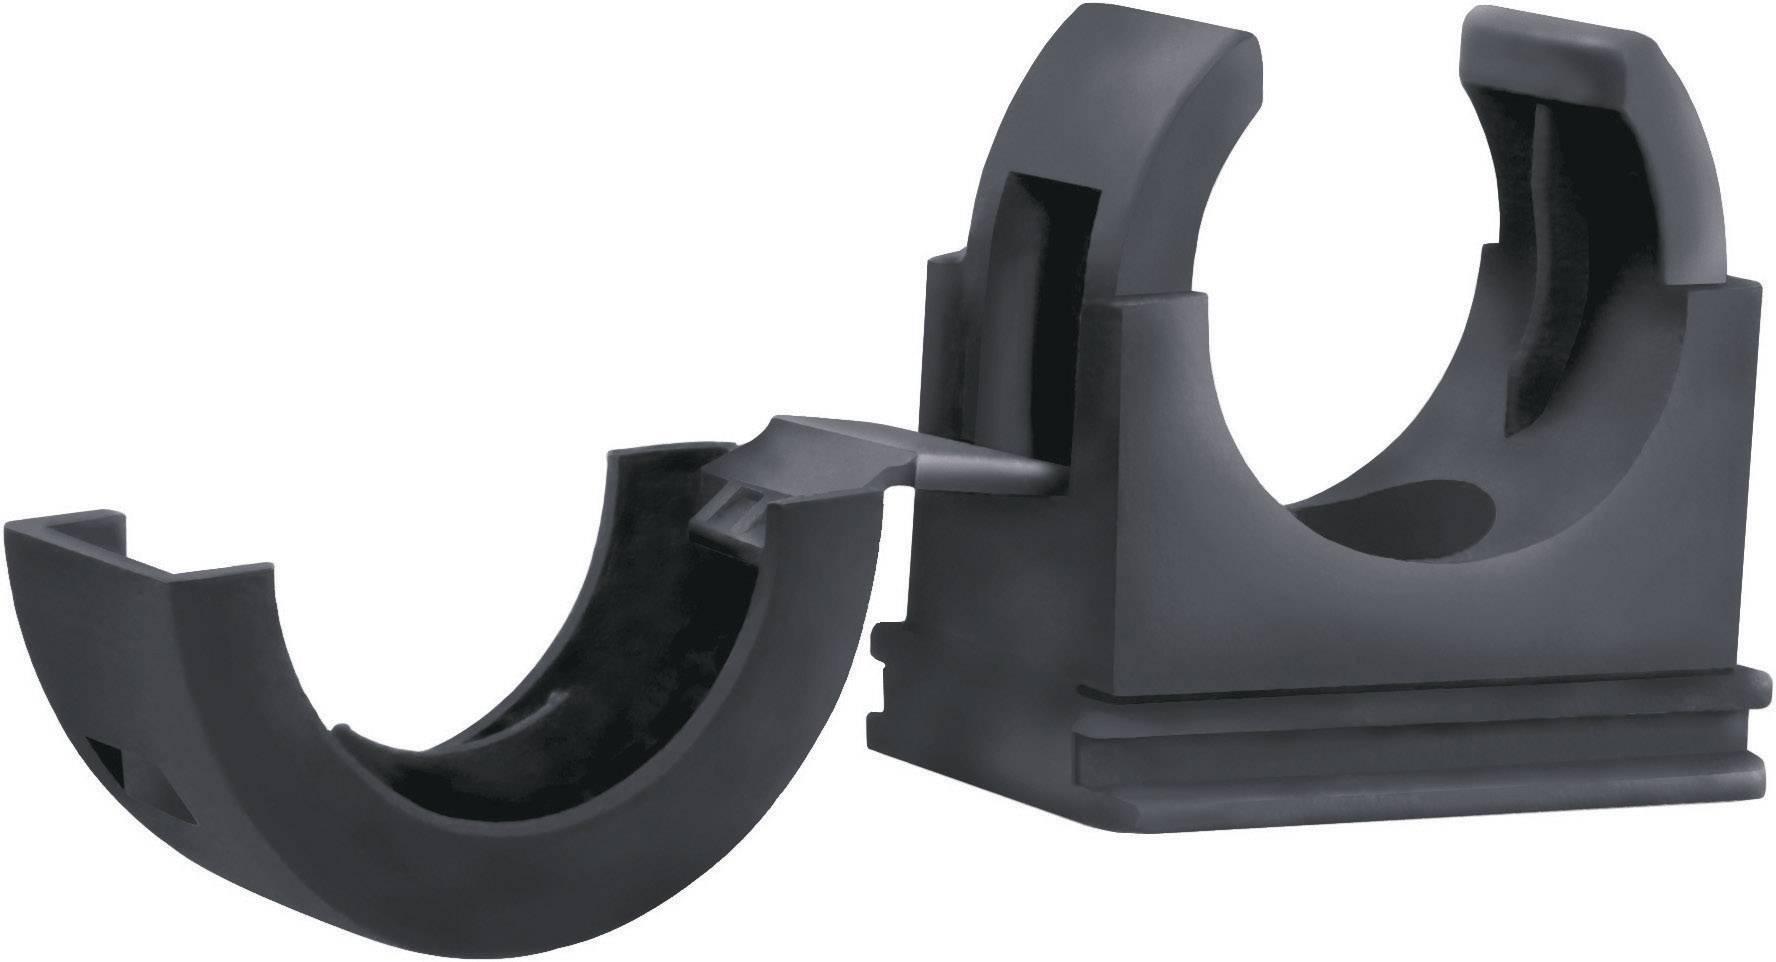 Držák hadice LAPP SILVYN® FCL 20 GY 55507400, 20 mm, šedá, 10 ks